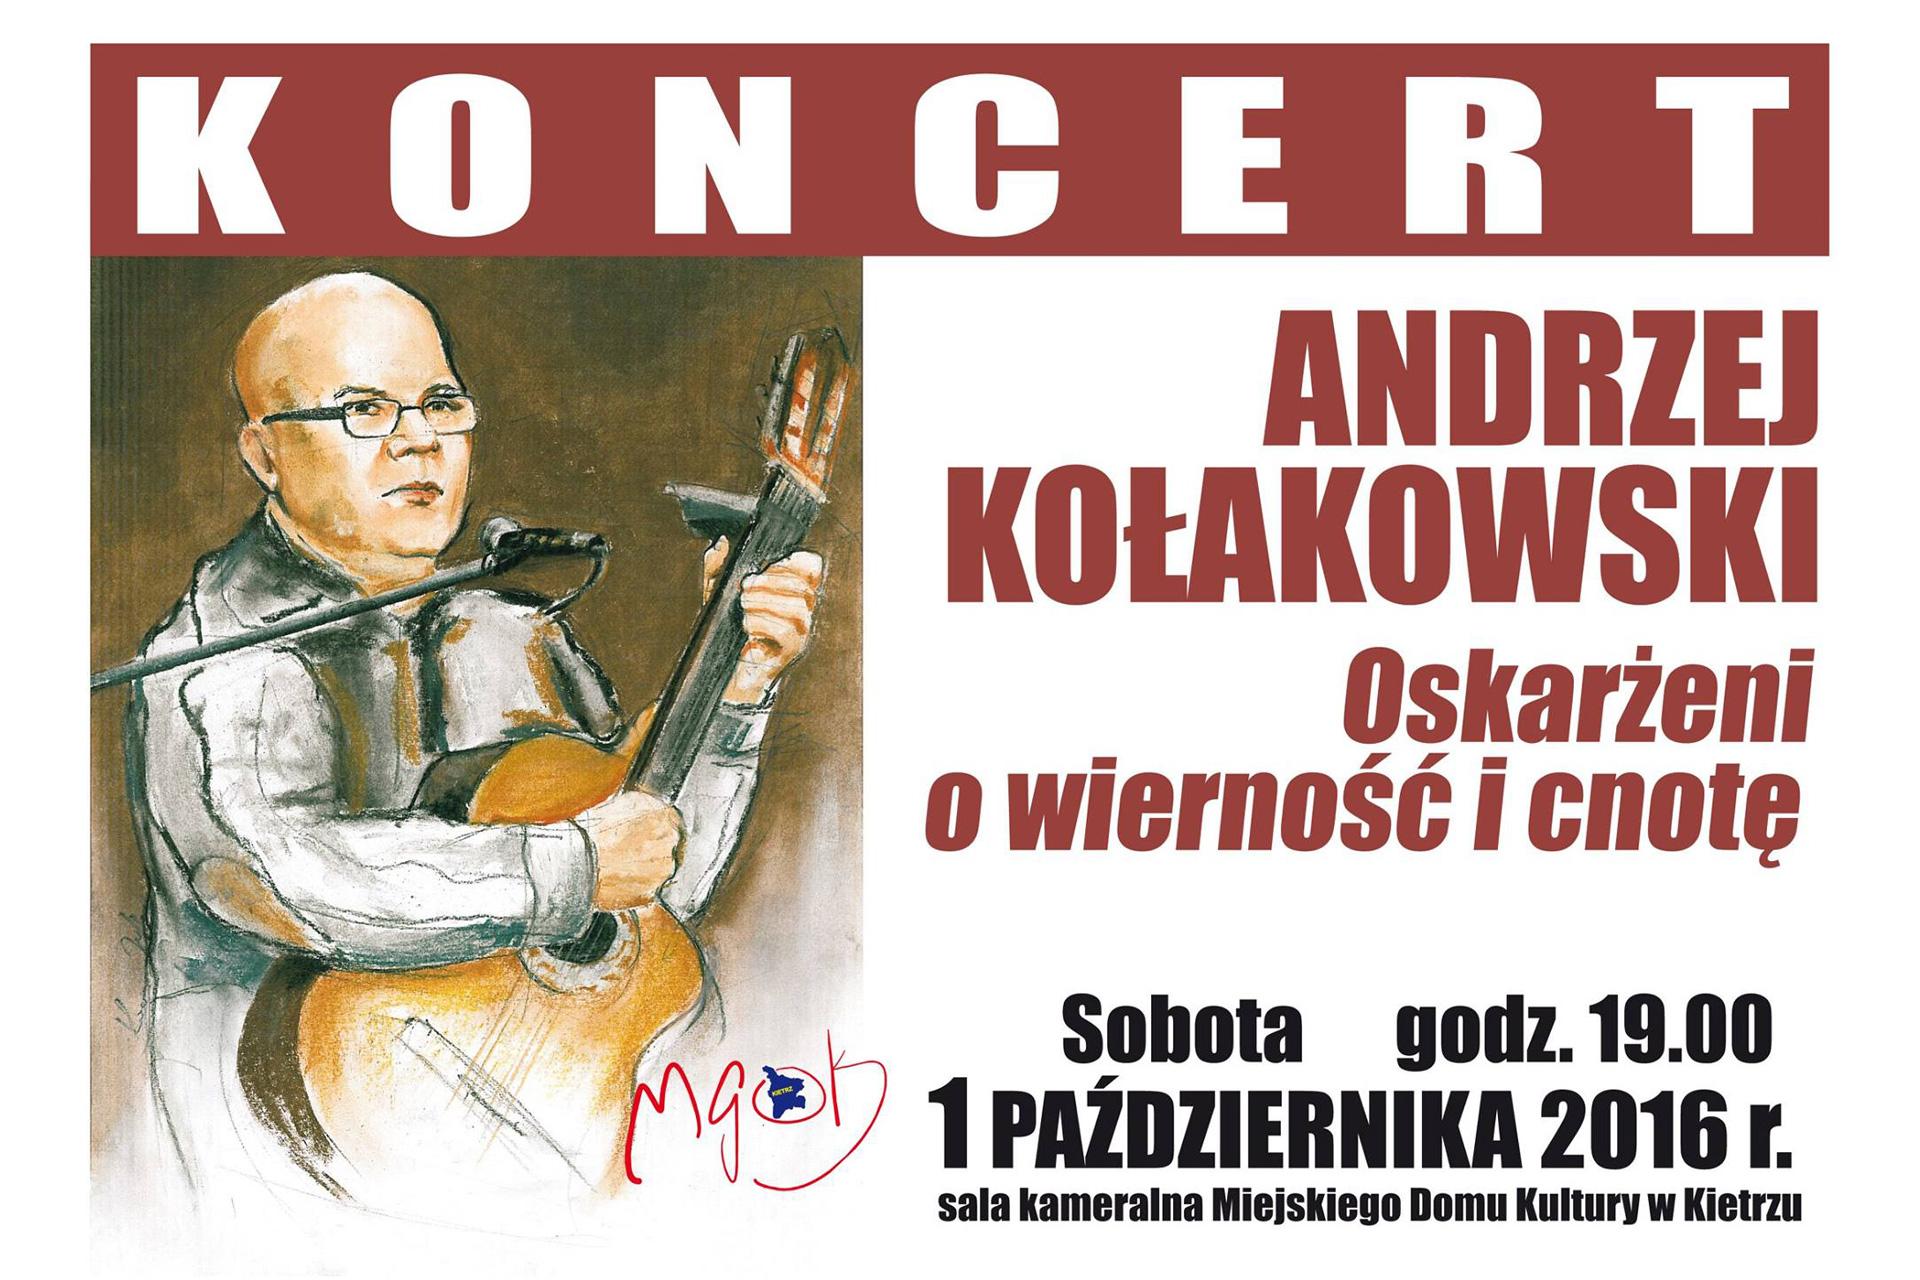 kietrz_koncert-kolakowski-20161001-big